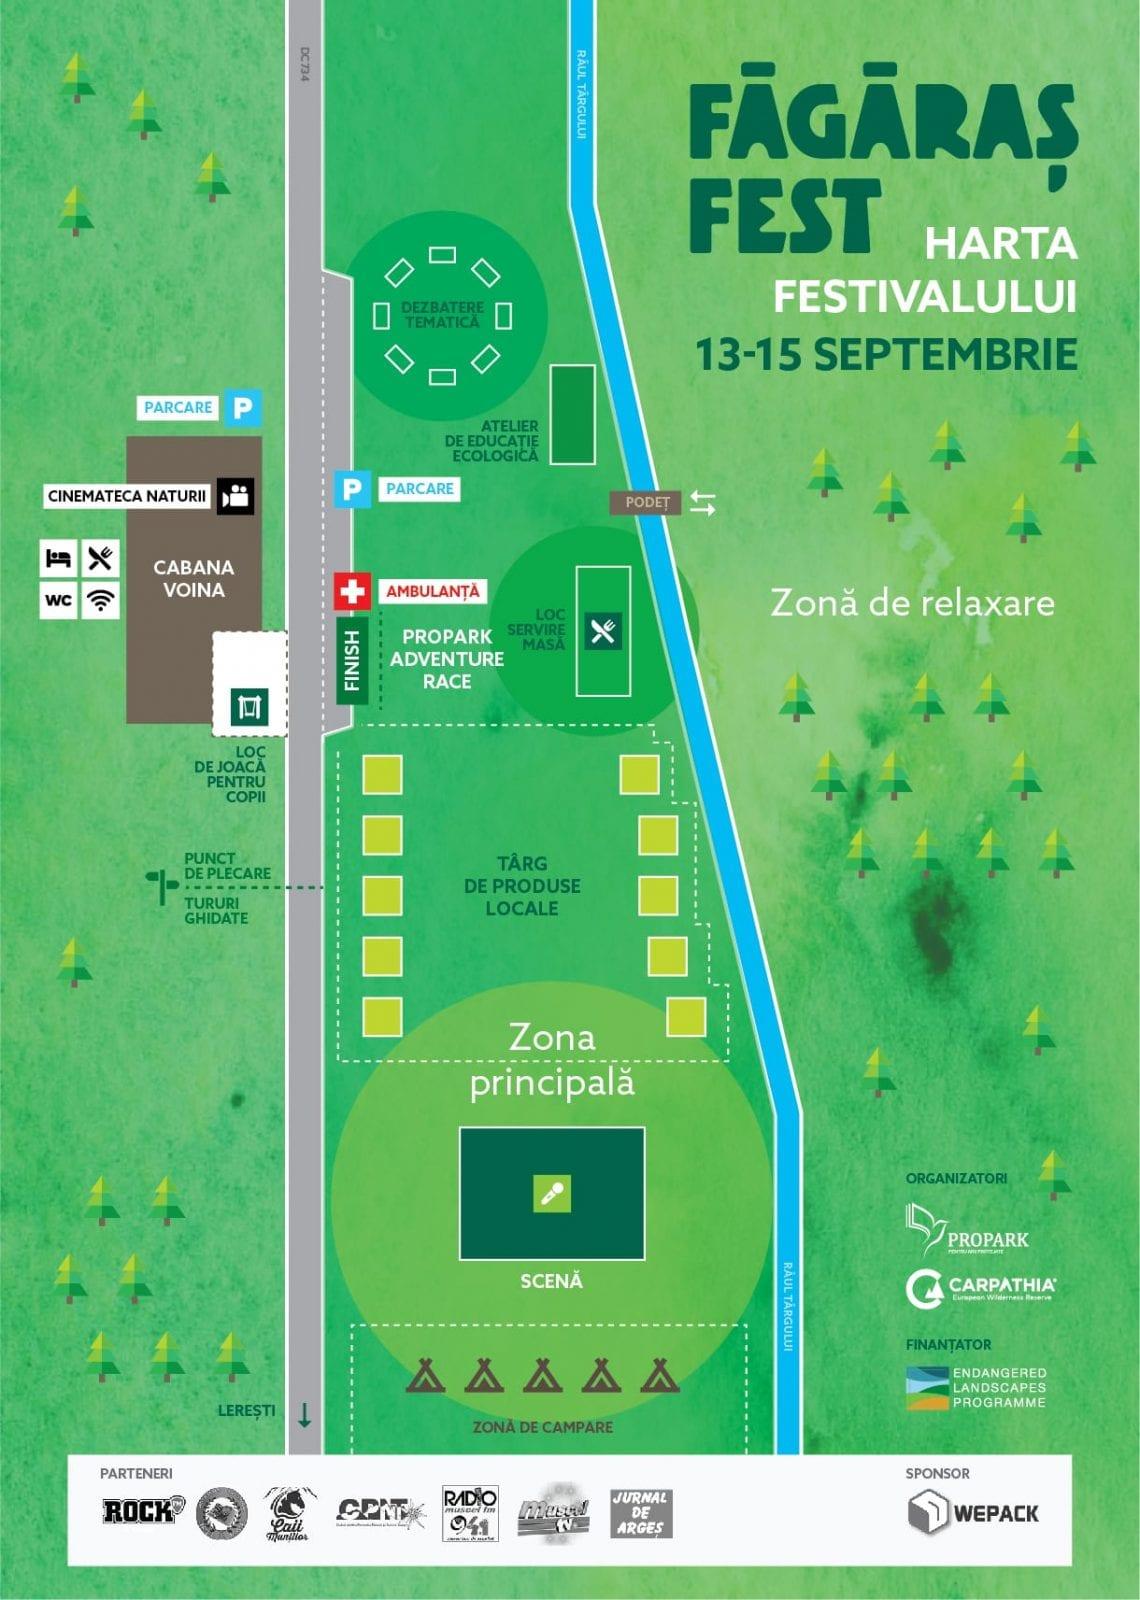 harta Fagaras Fest